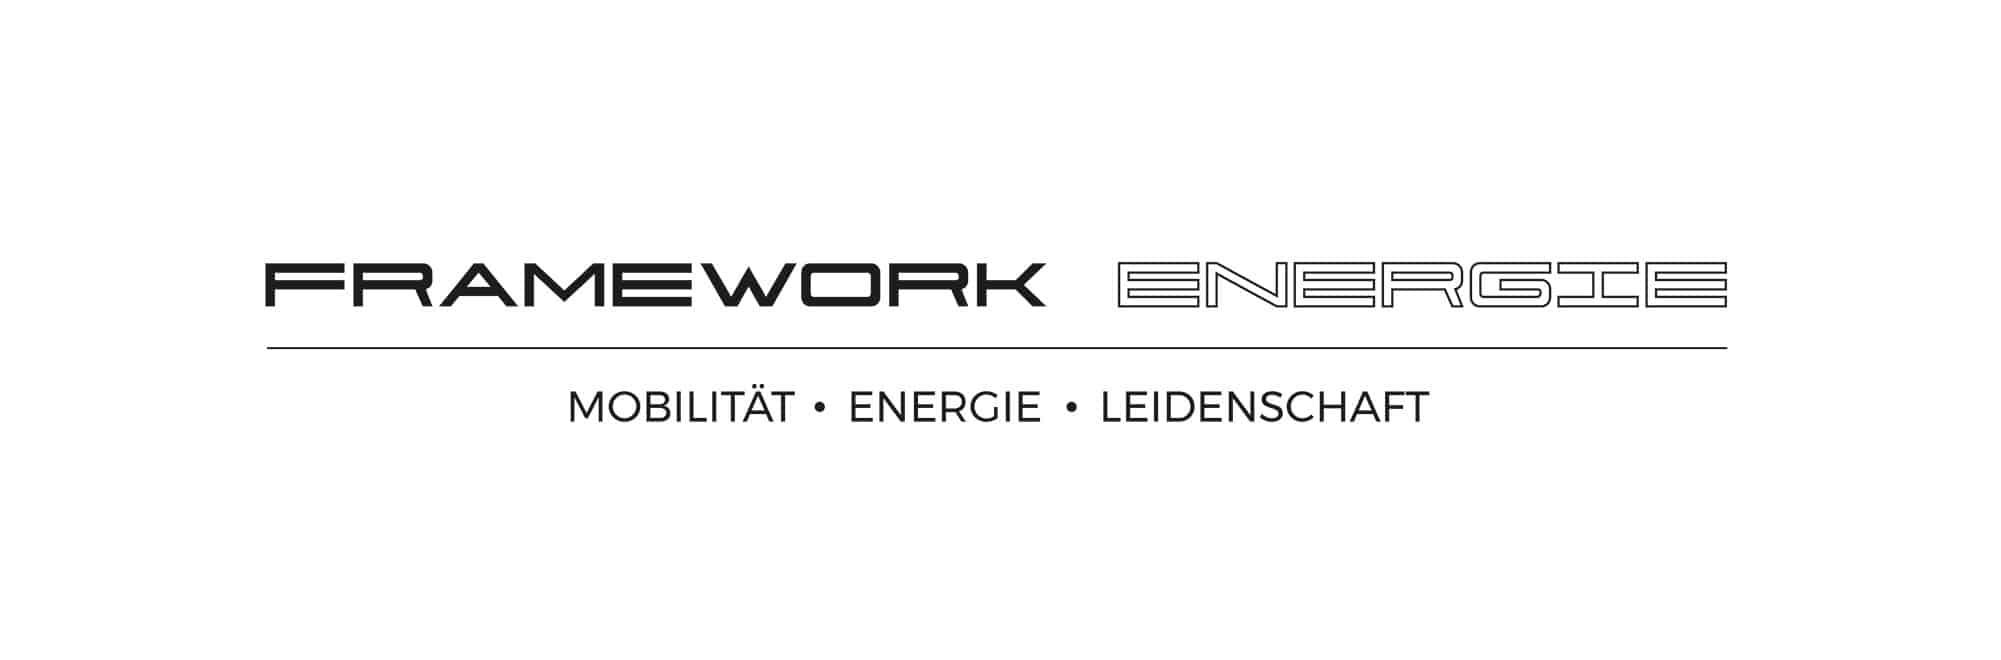 Logo Design - Framework Energie GmbH - Logo Design aus Eckernförde - Schleswig Holstein - Umgebung Kiel - Logo Designer Andrea Baitz